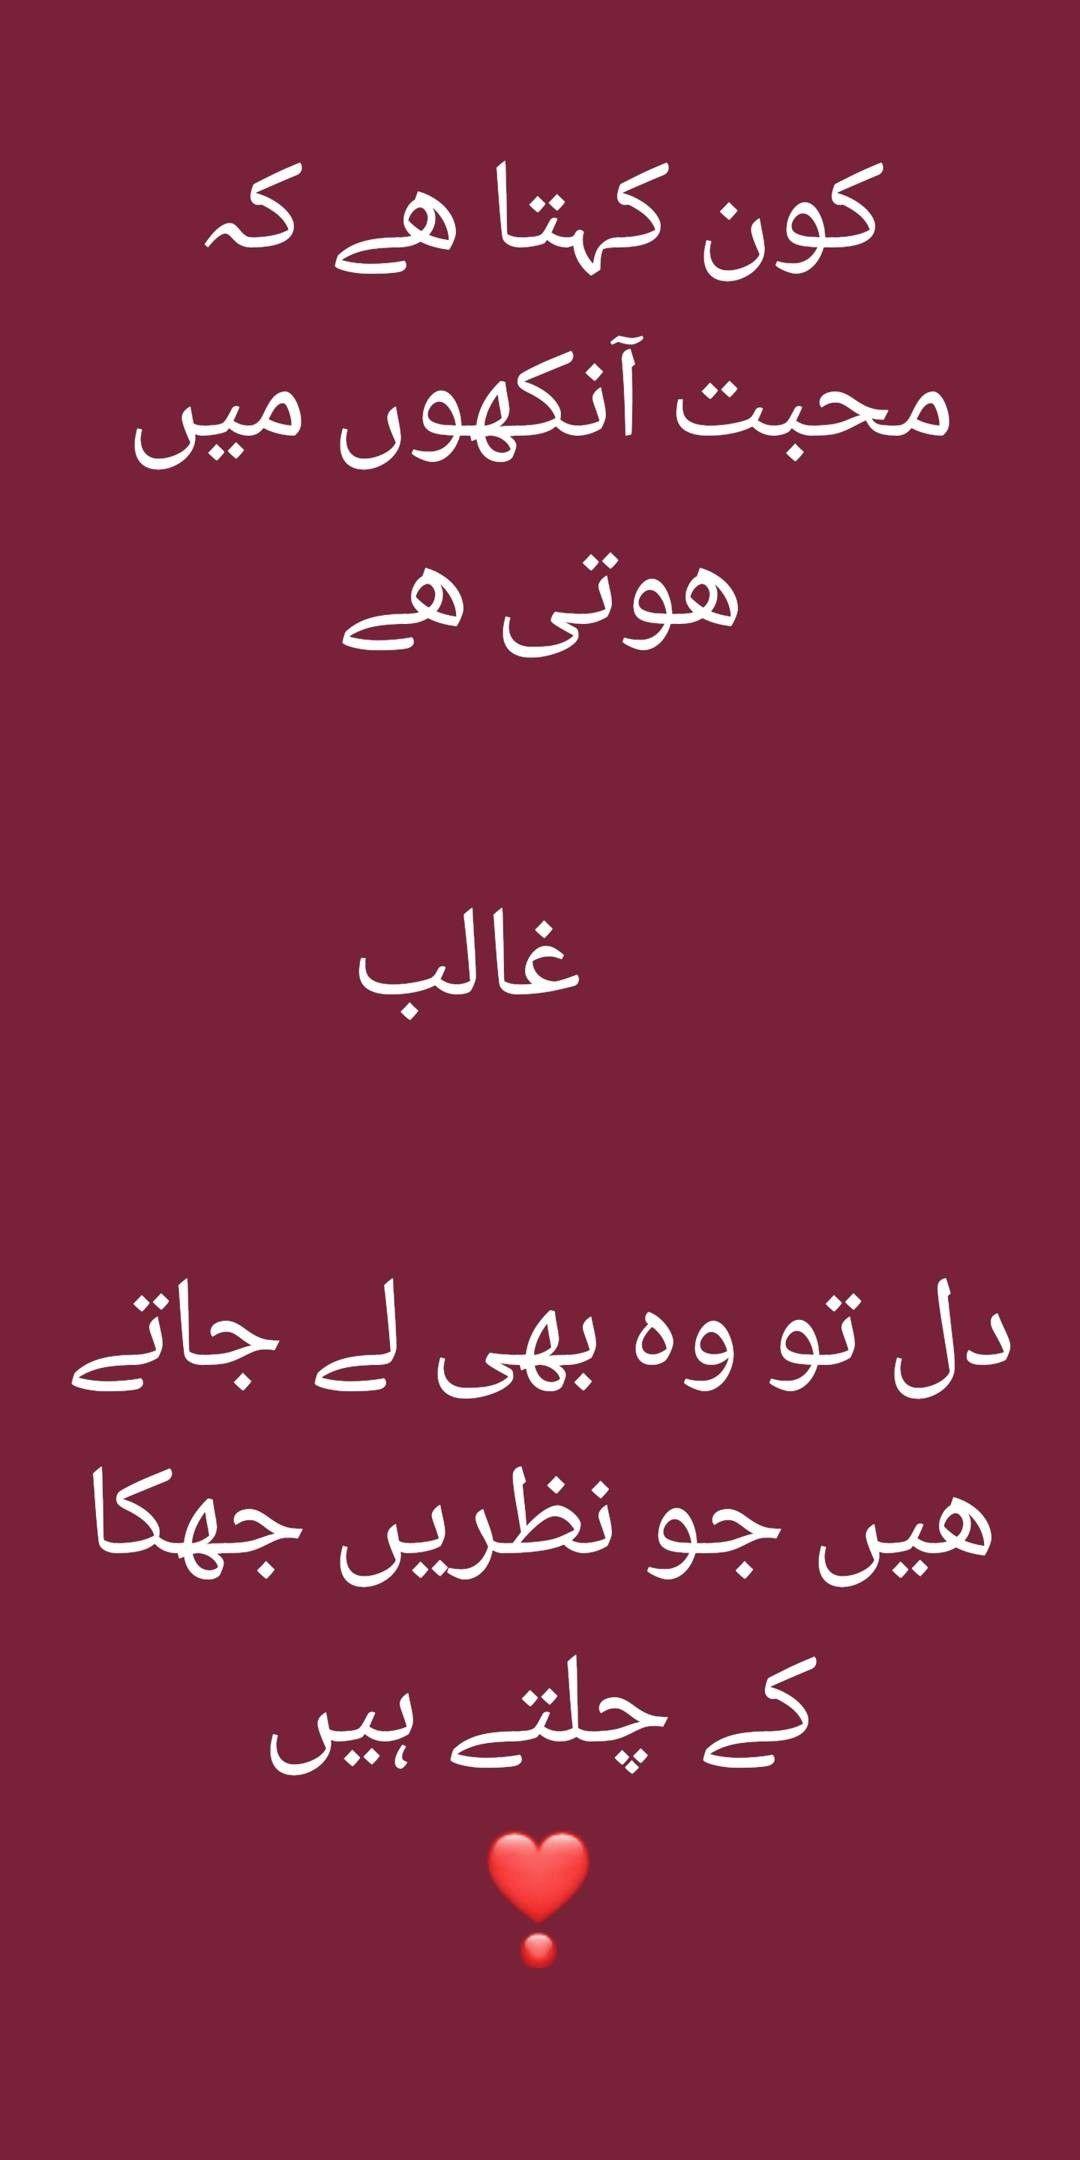 Funny Marriage Poetry In Urdu : funny, marriage, poetry, Poetry, Romantic,, Urdu,, Funny